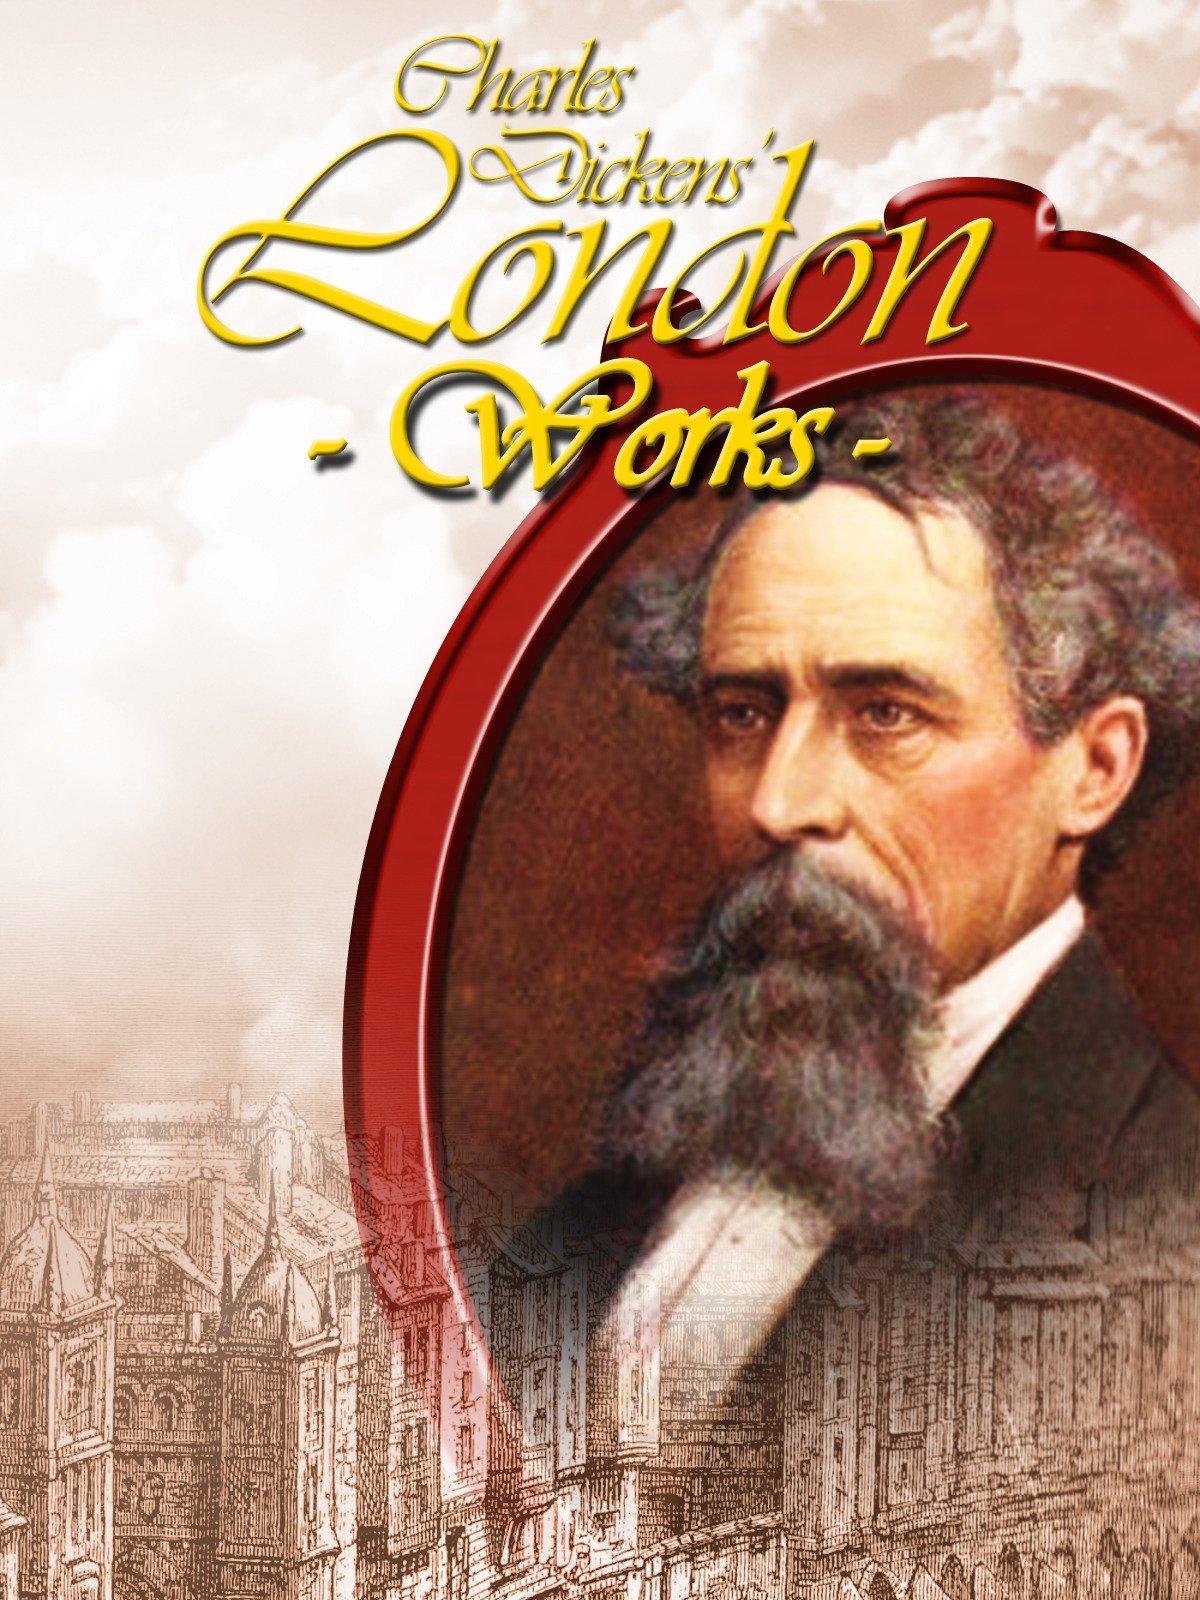 Charles Dickens' London Works